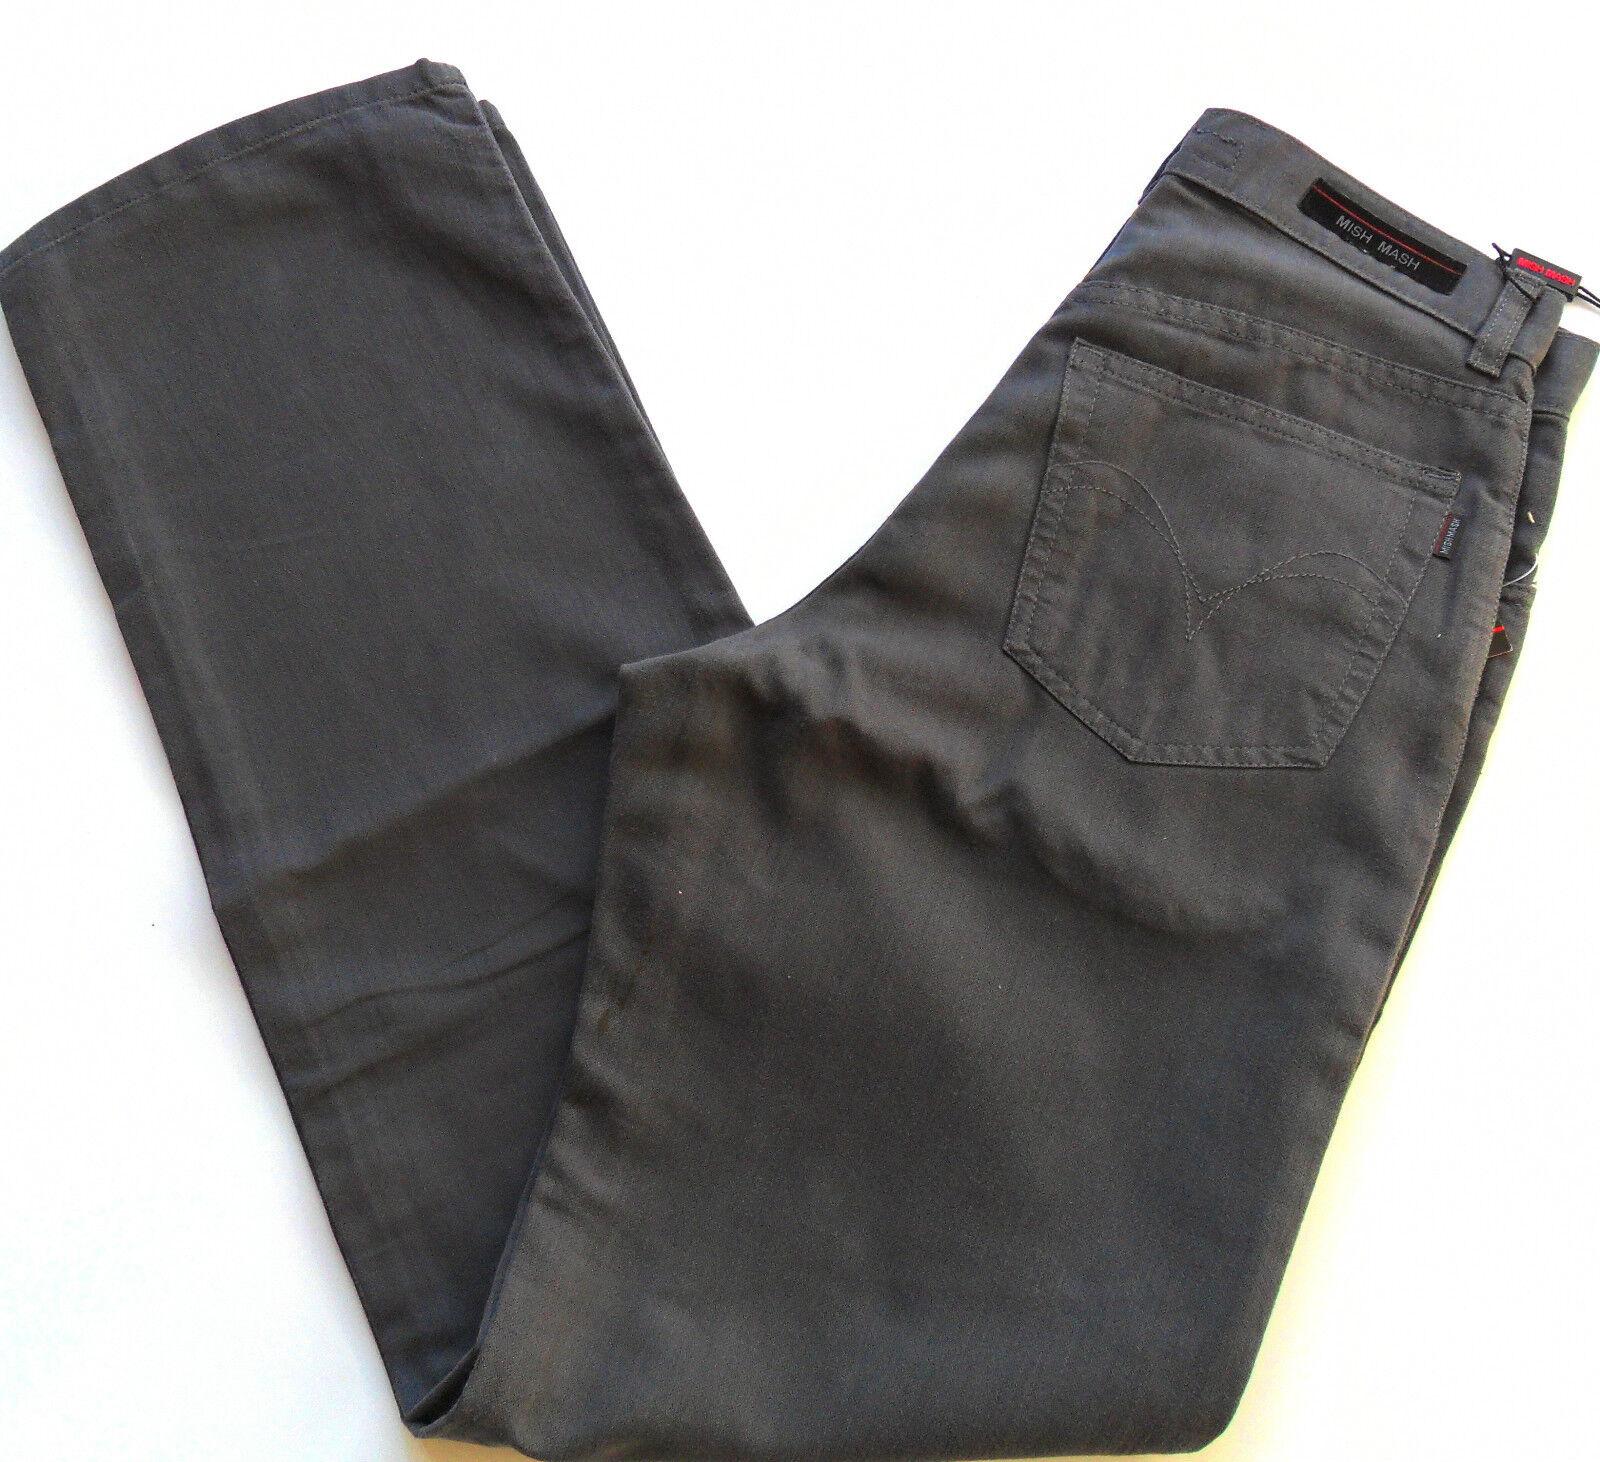 Mish MASH Da Uomo Comfort Fit Pantaloni Pantaloni Blu Scuro Vita 30 32 34 36 Oliver